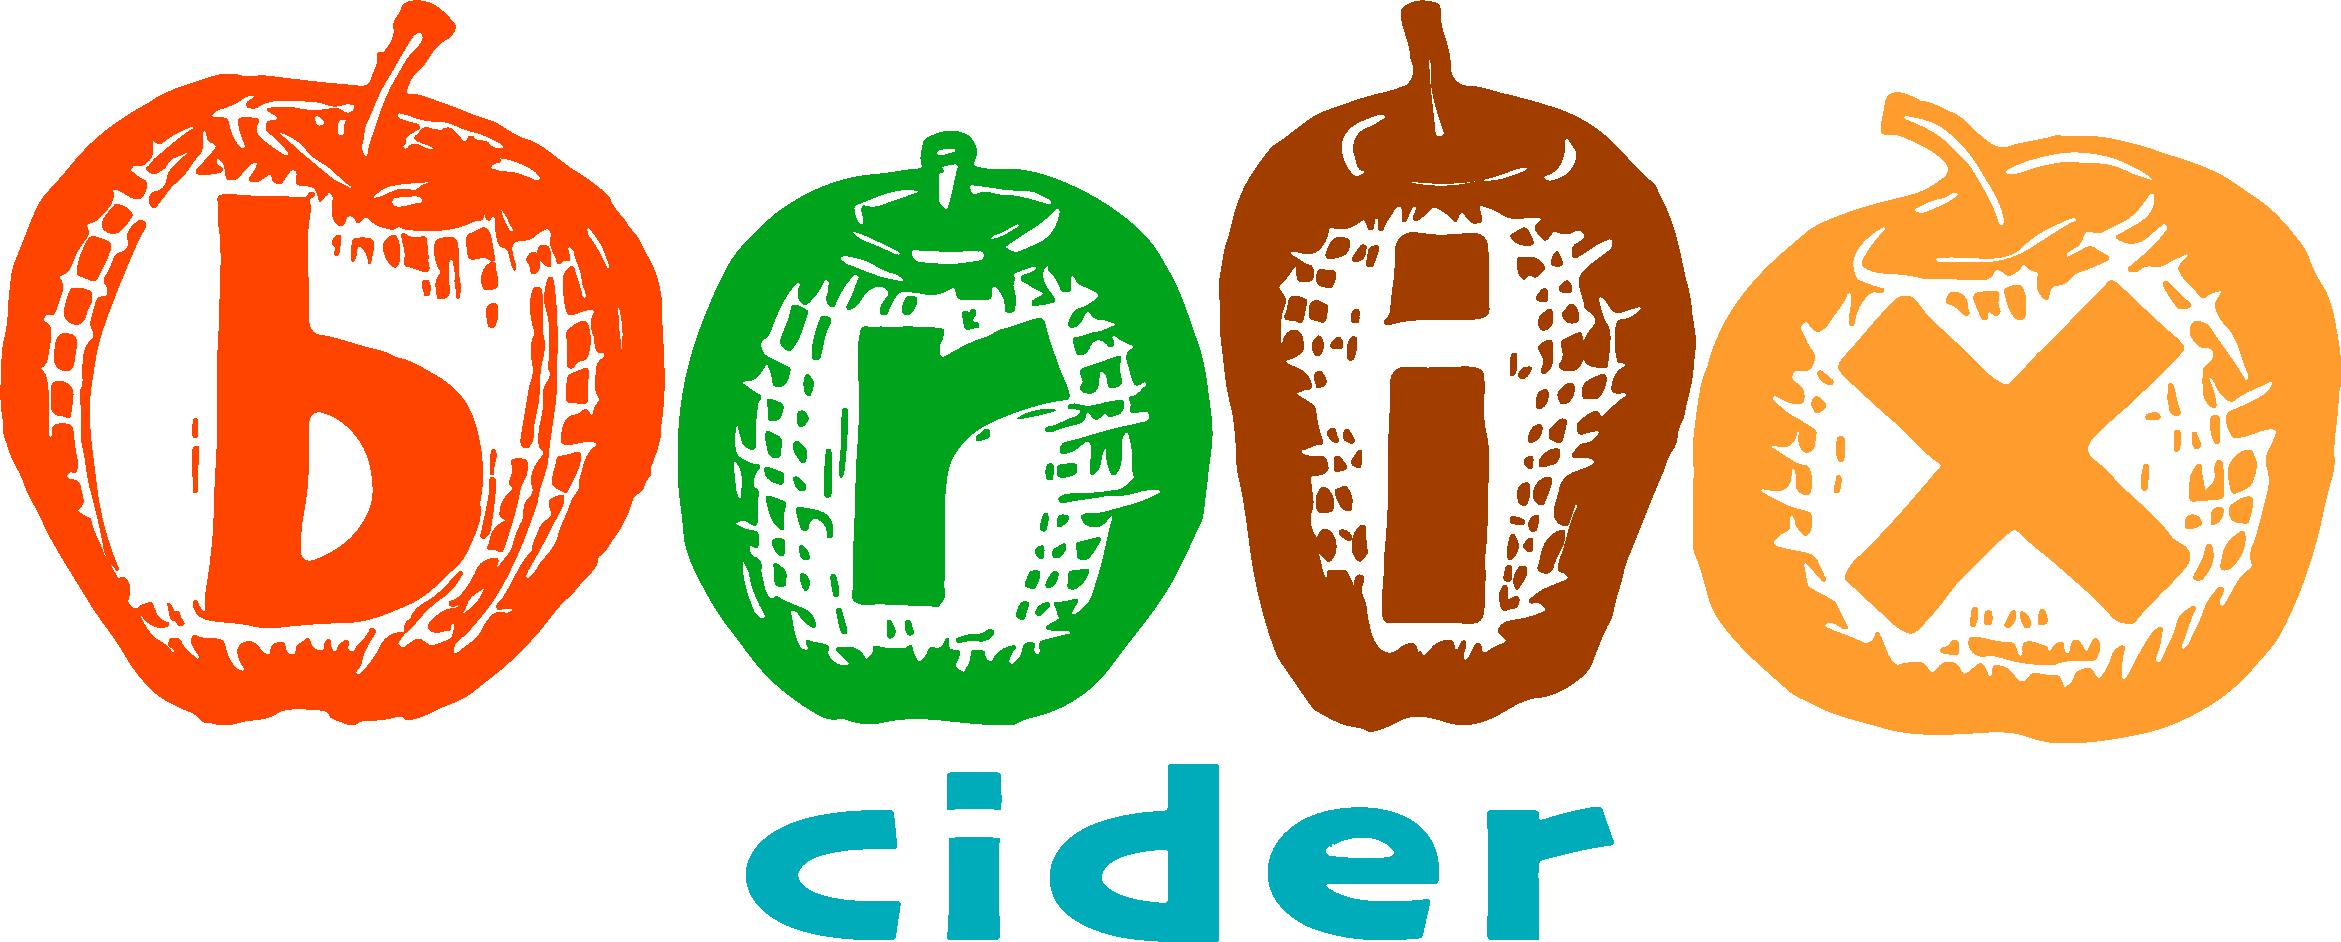 Brix Cider logo